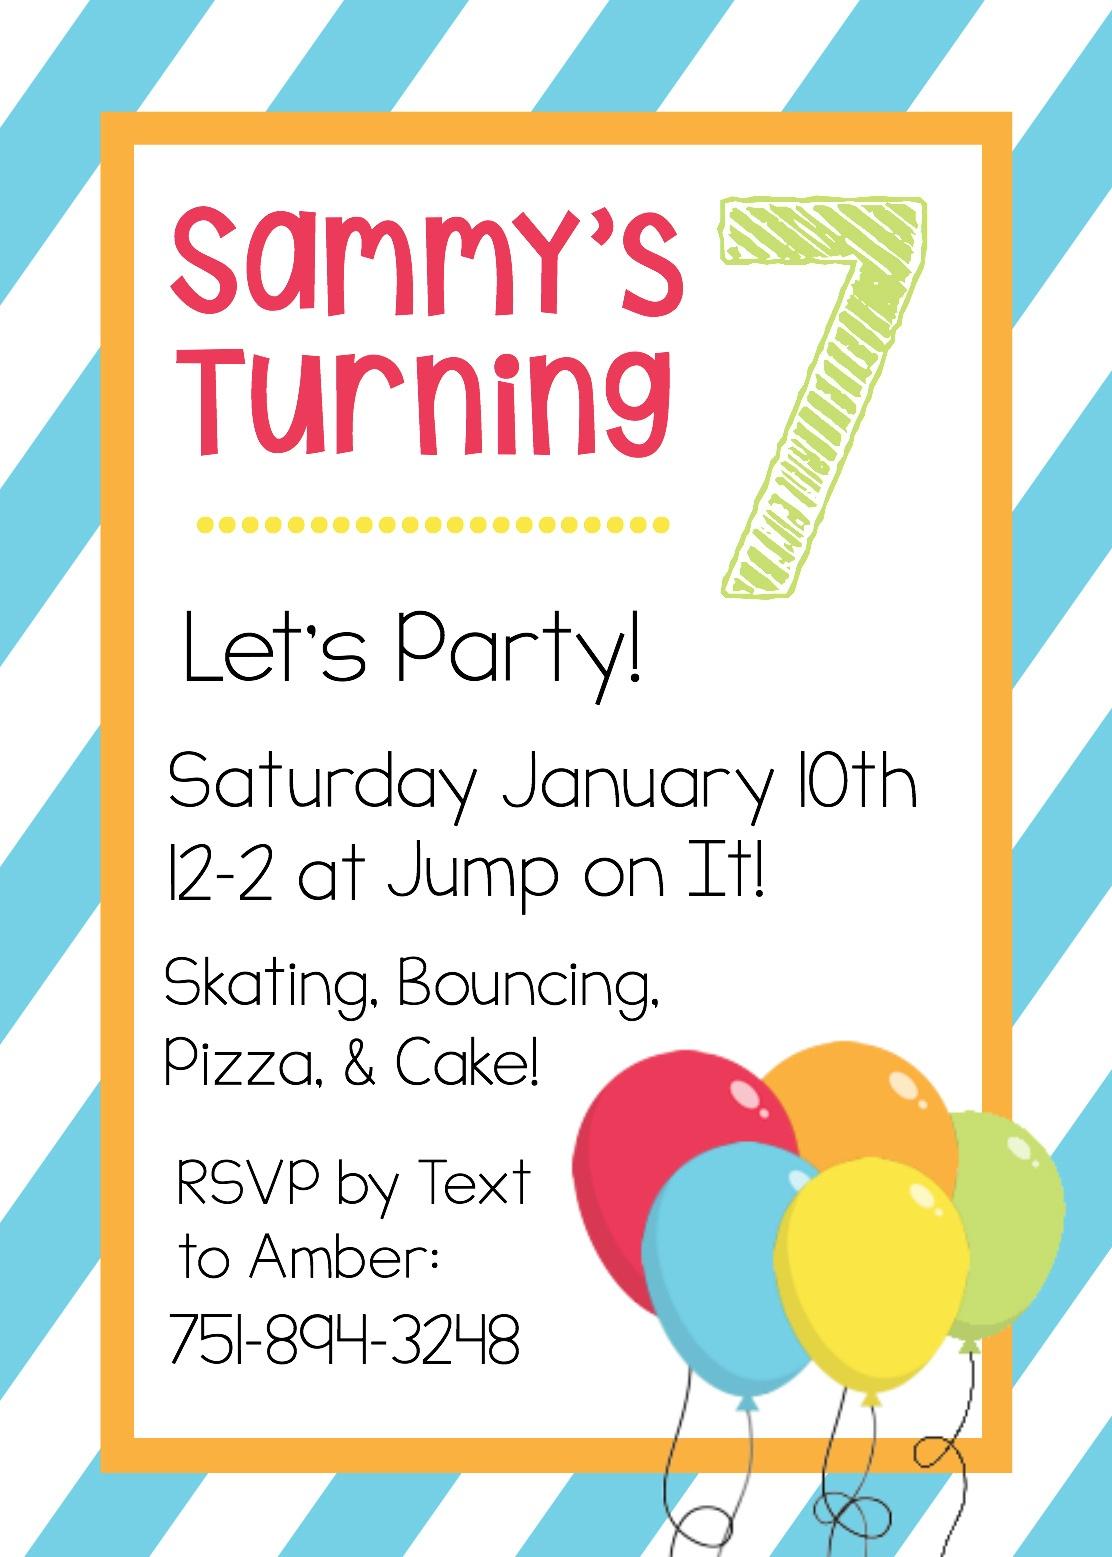 Free Printable Birthday Invitation Templates - Free Printable Invitations